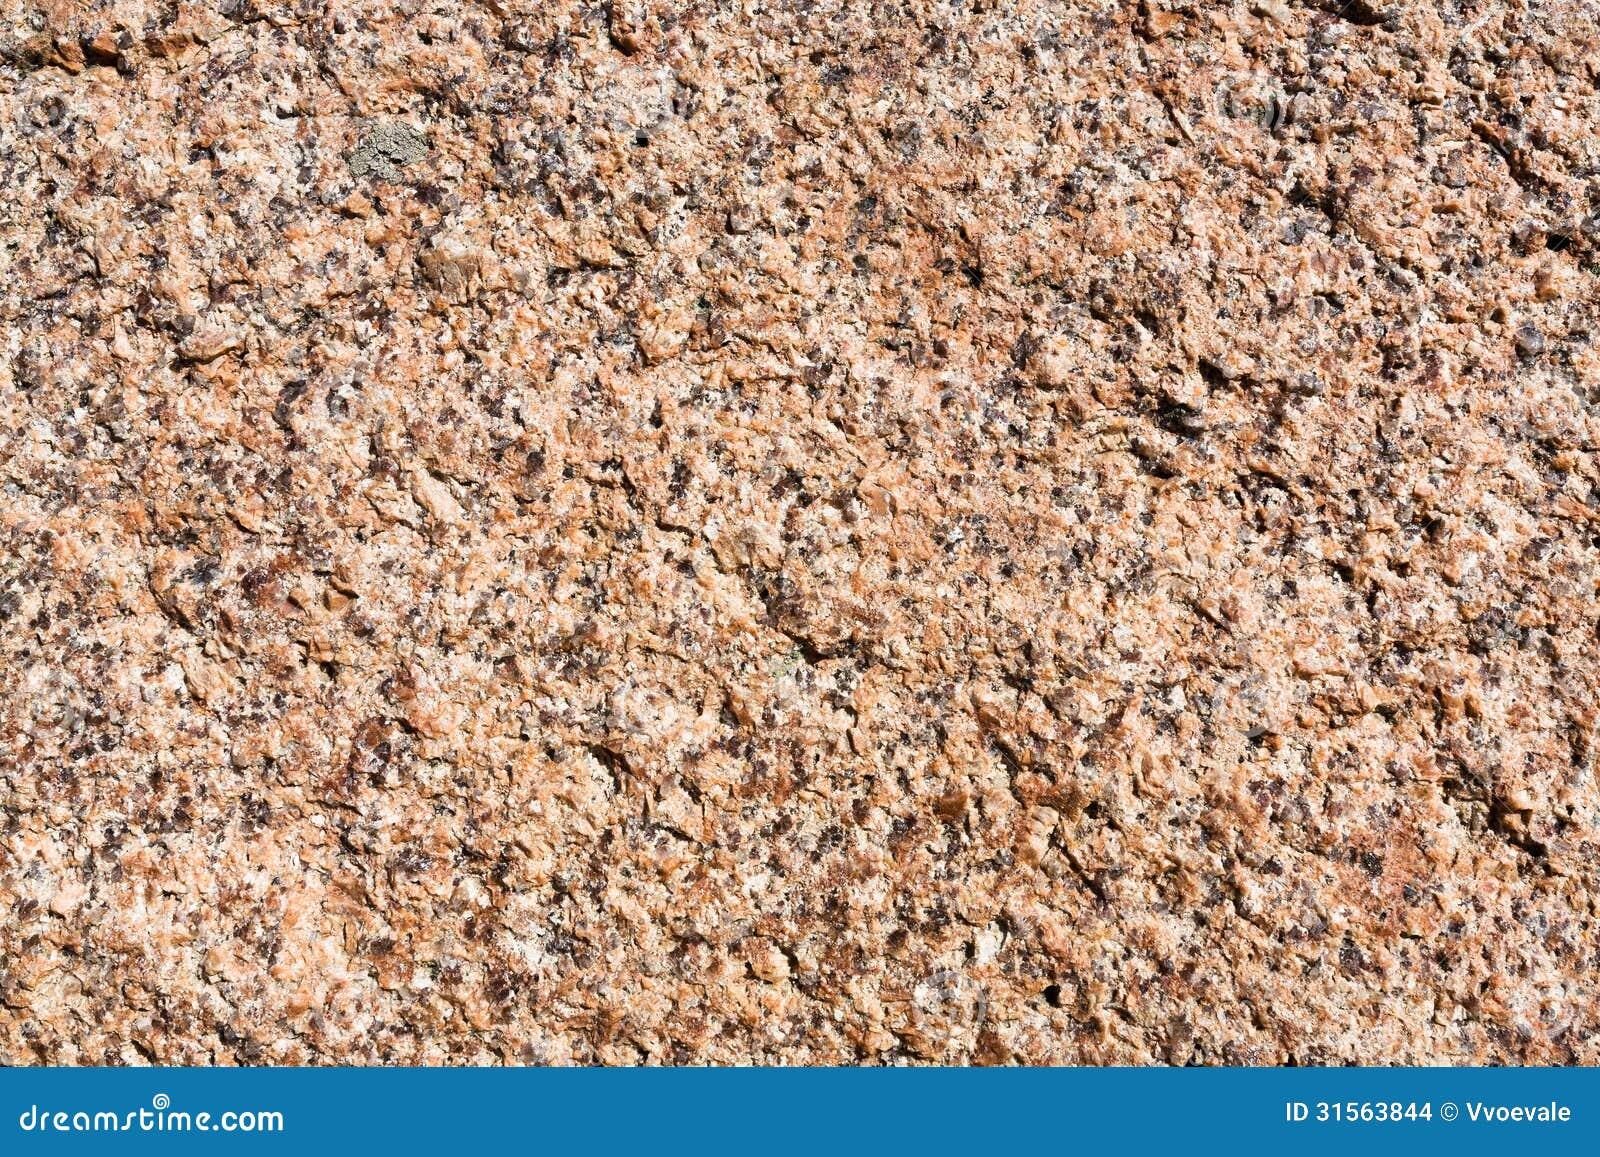 Granite Surface : Pink Granite Textured Surface Stock Images - Image: 31563844